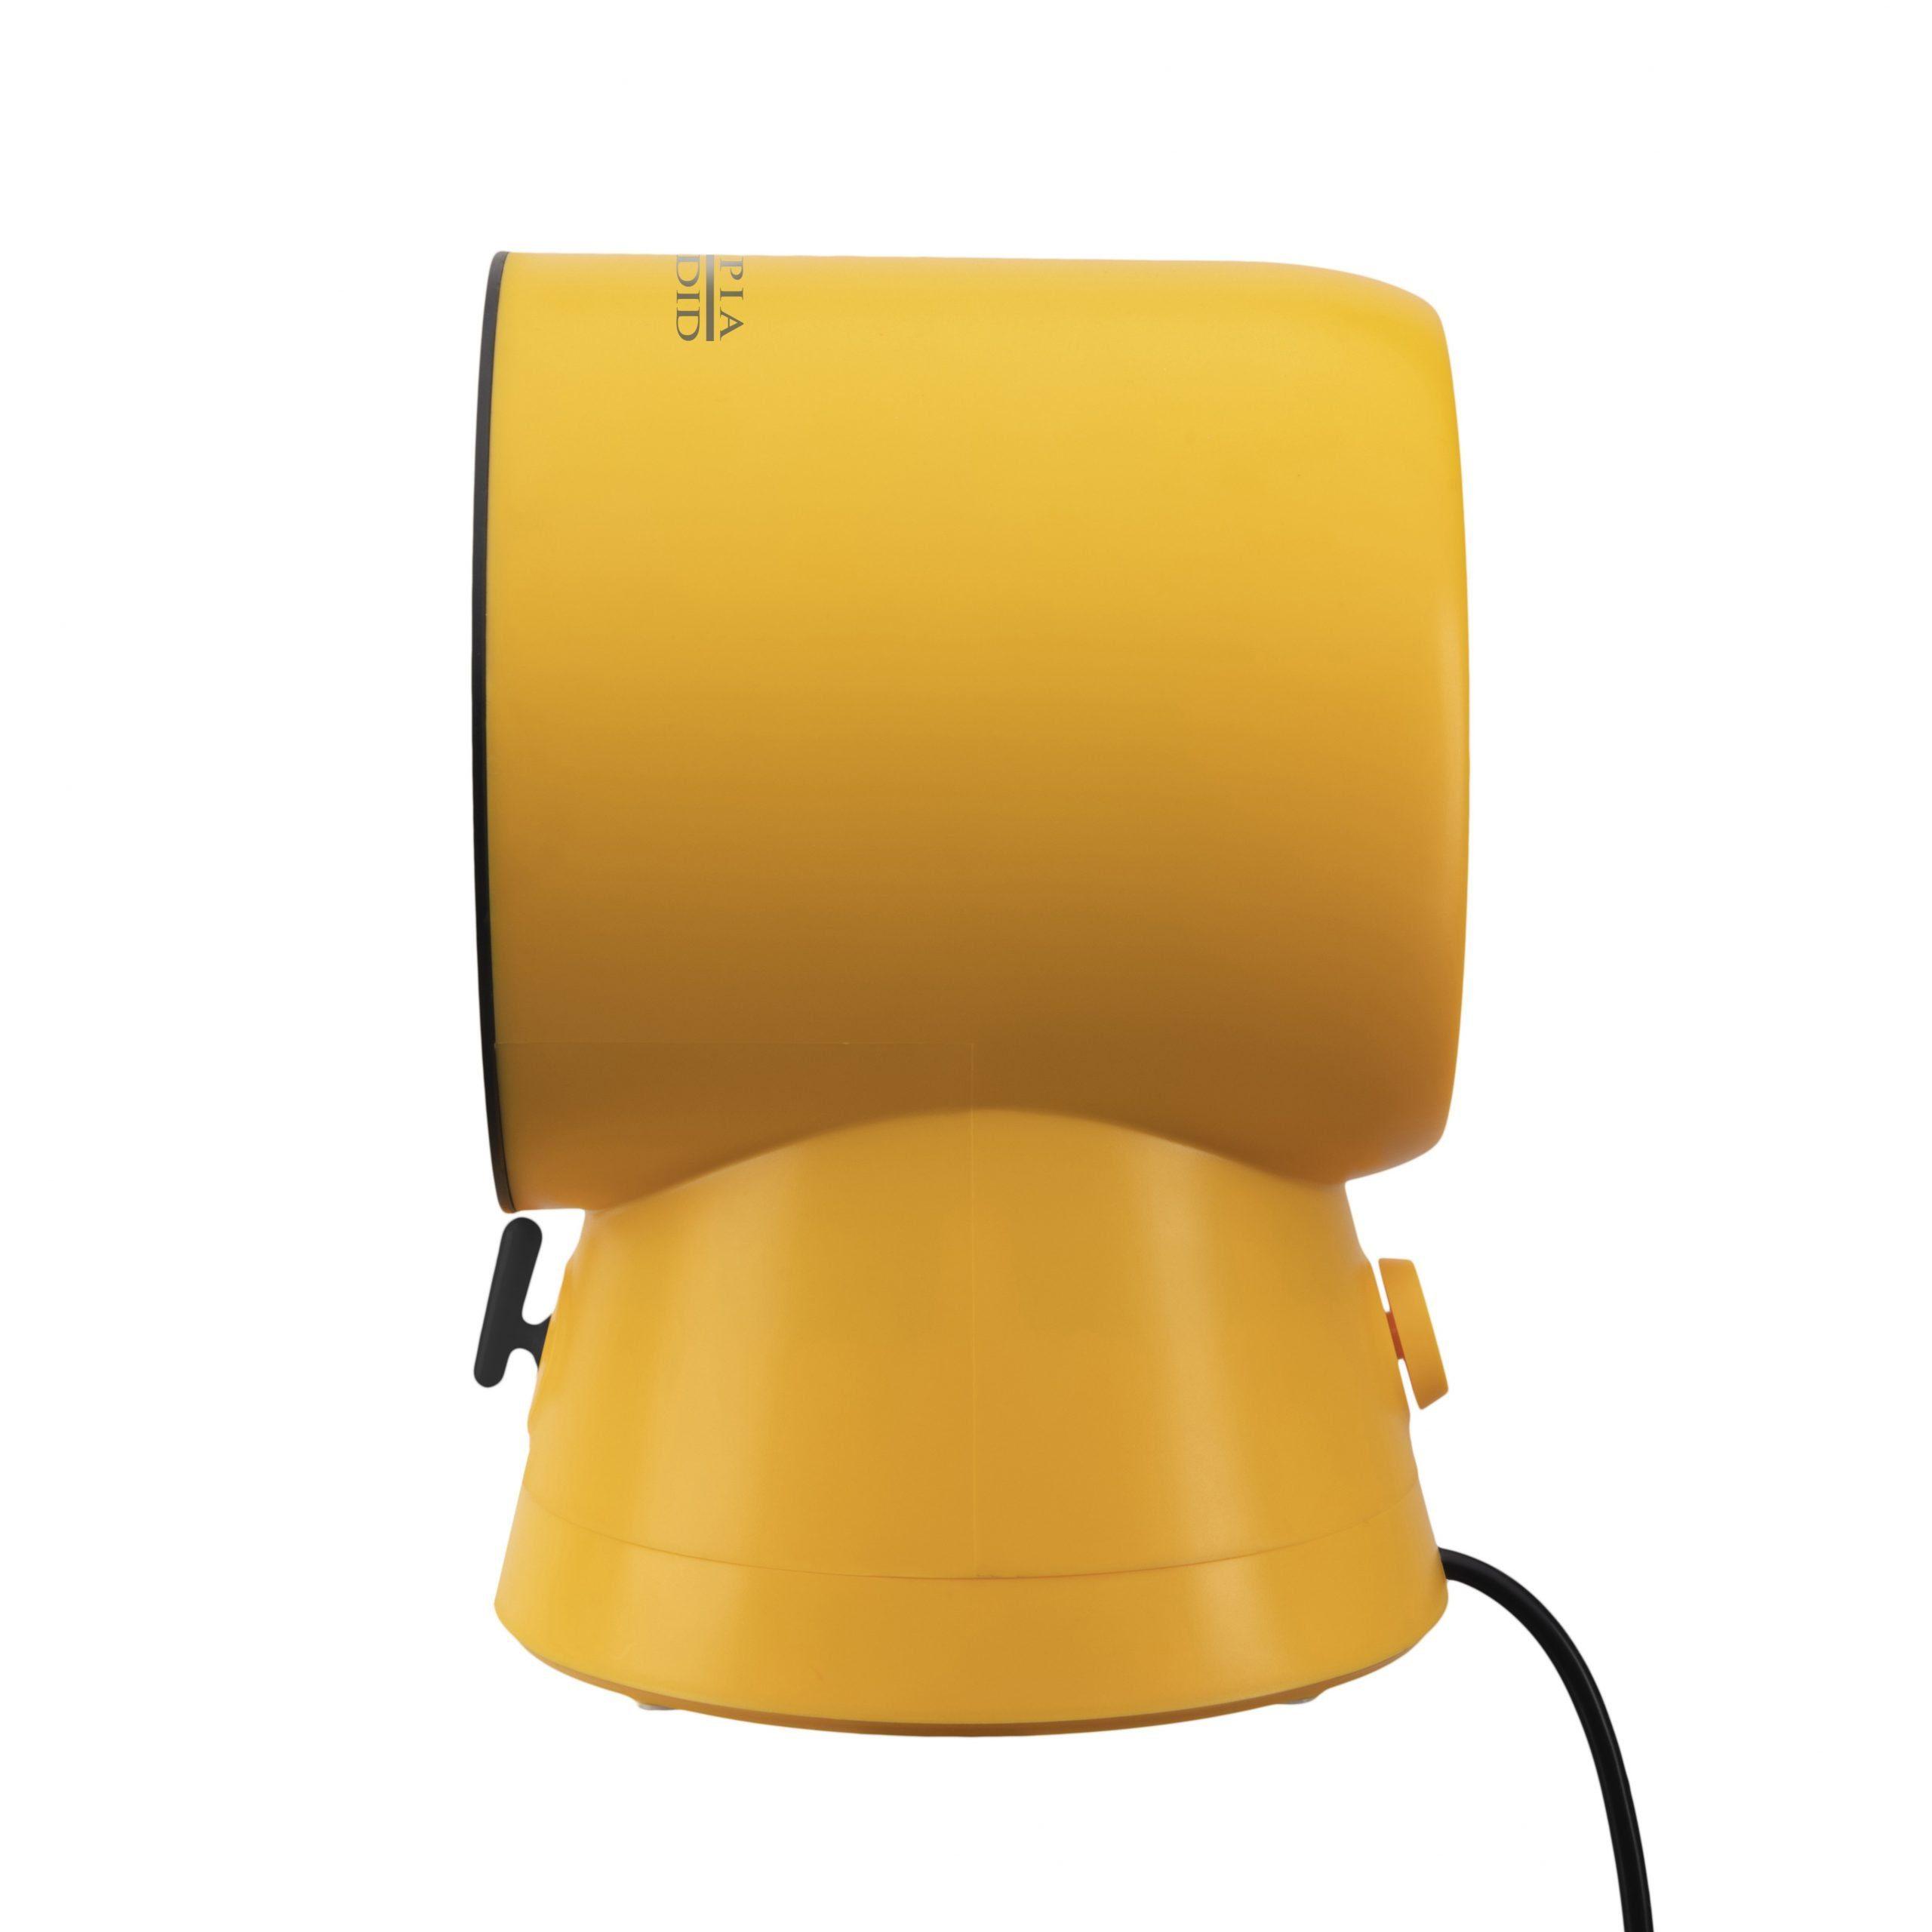 termoventilatore elettrico stile vintage